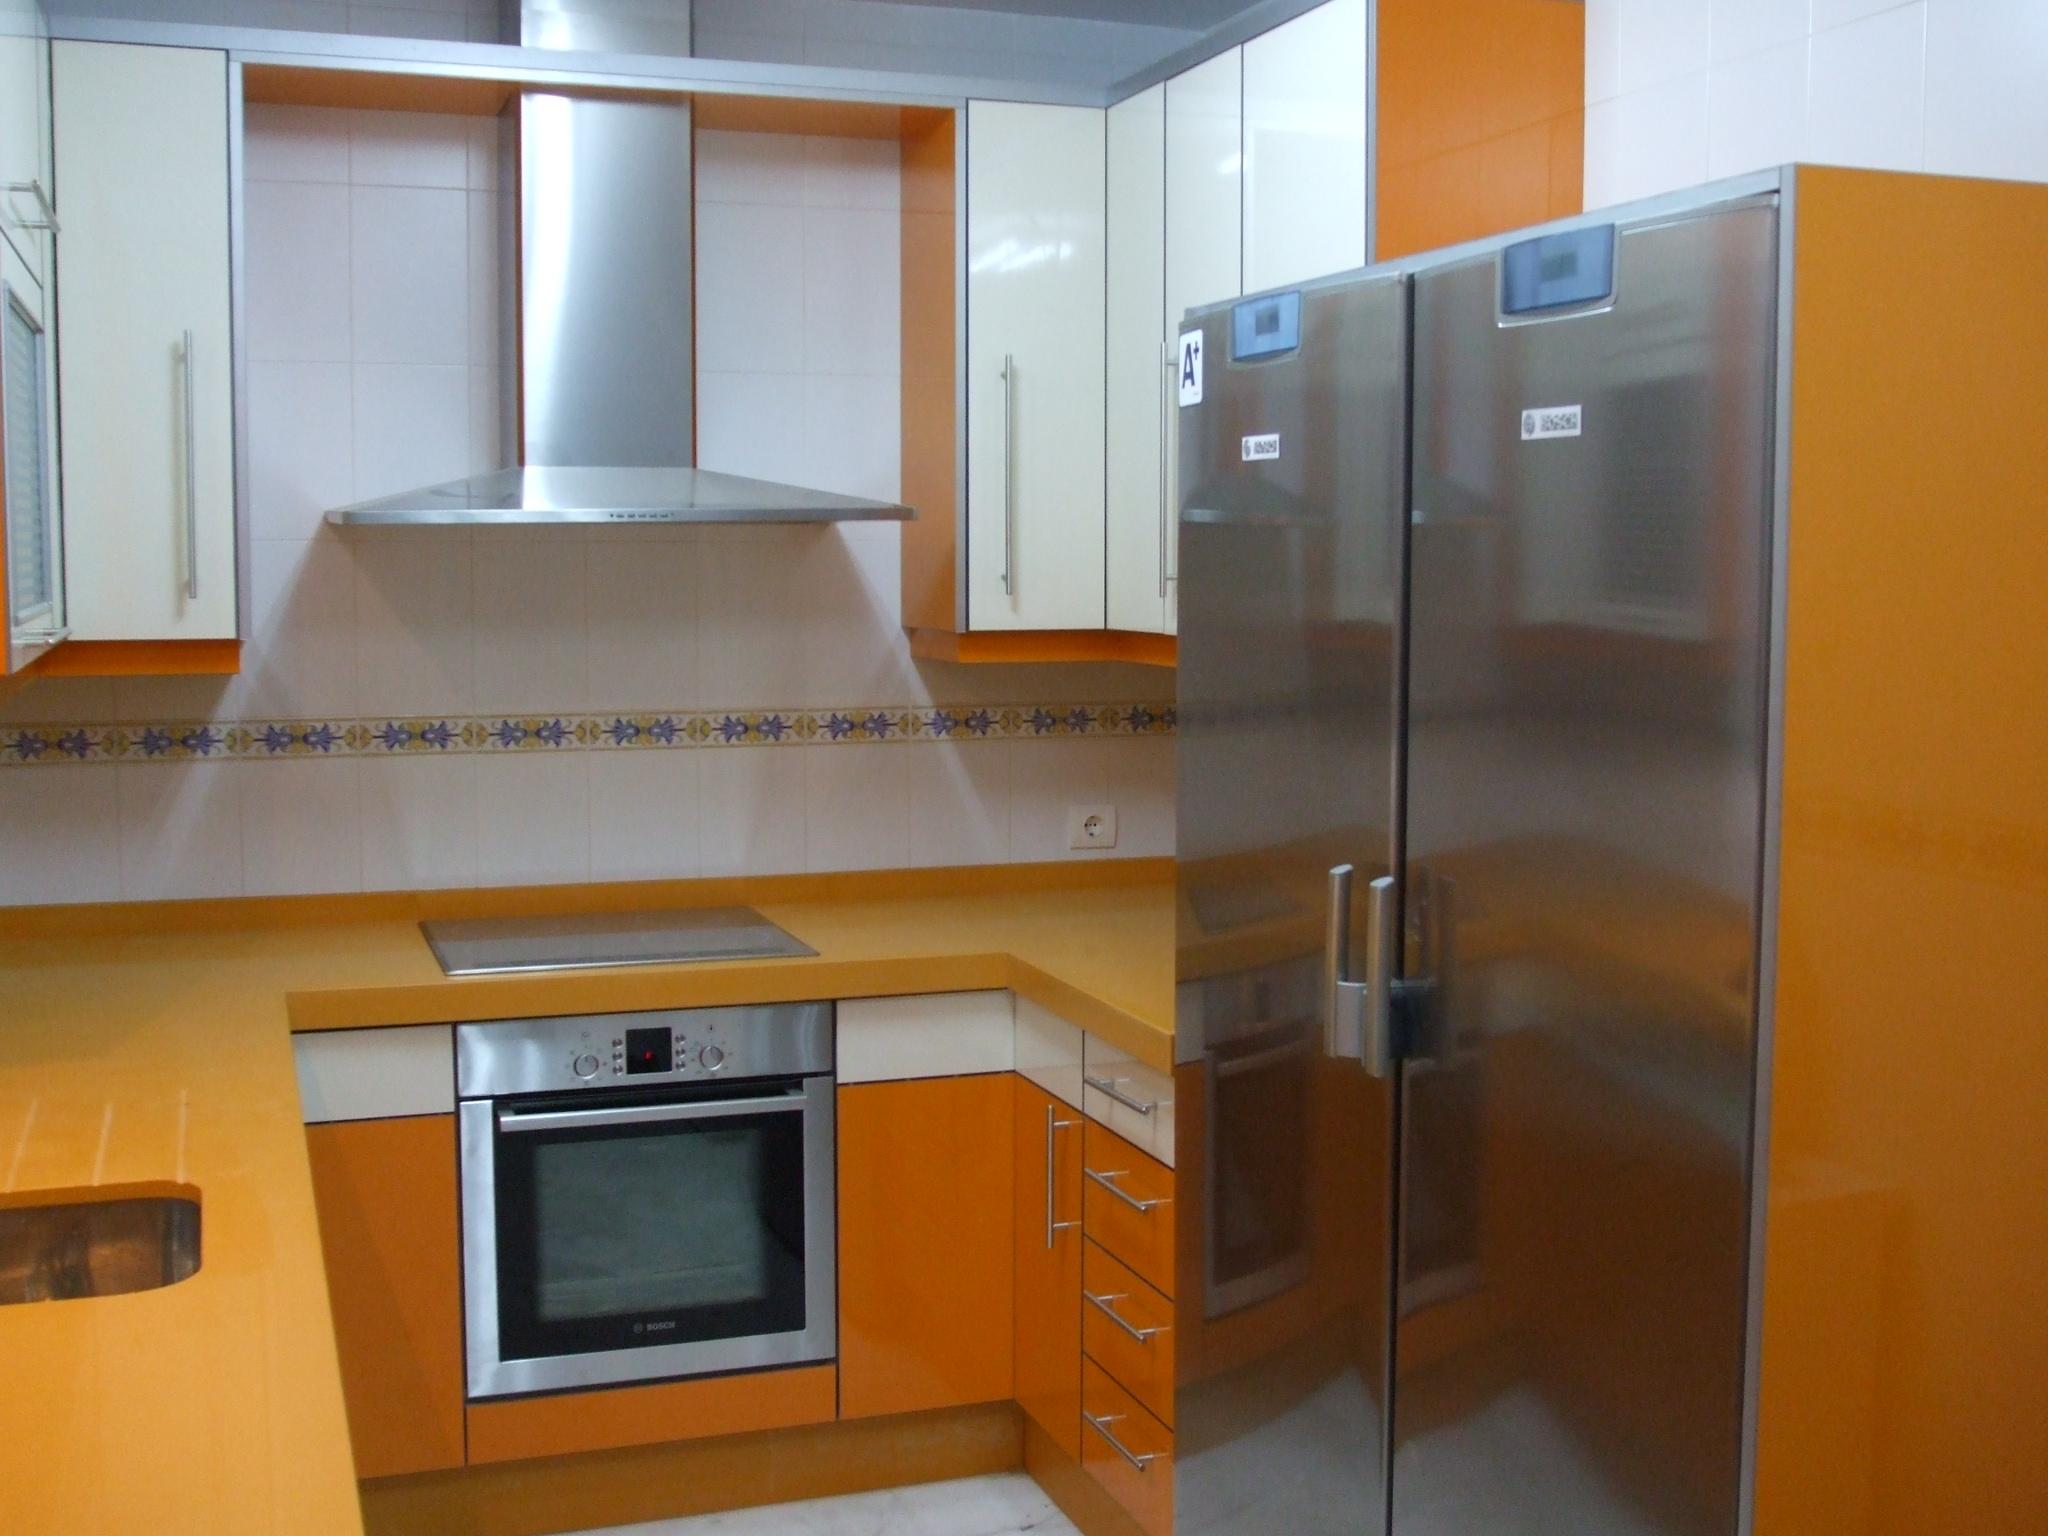 Cocinas modernas sevilla muebles leon for Muebles cocina leon